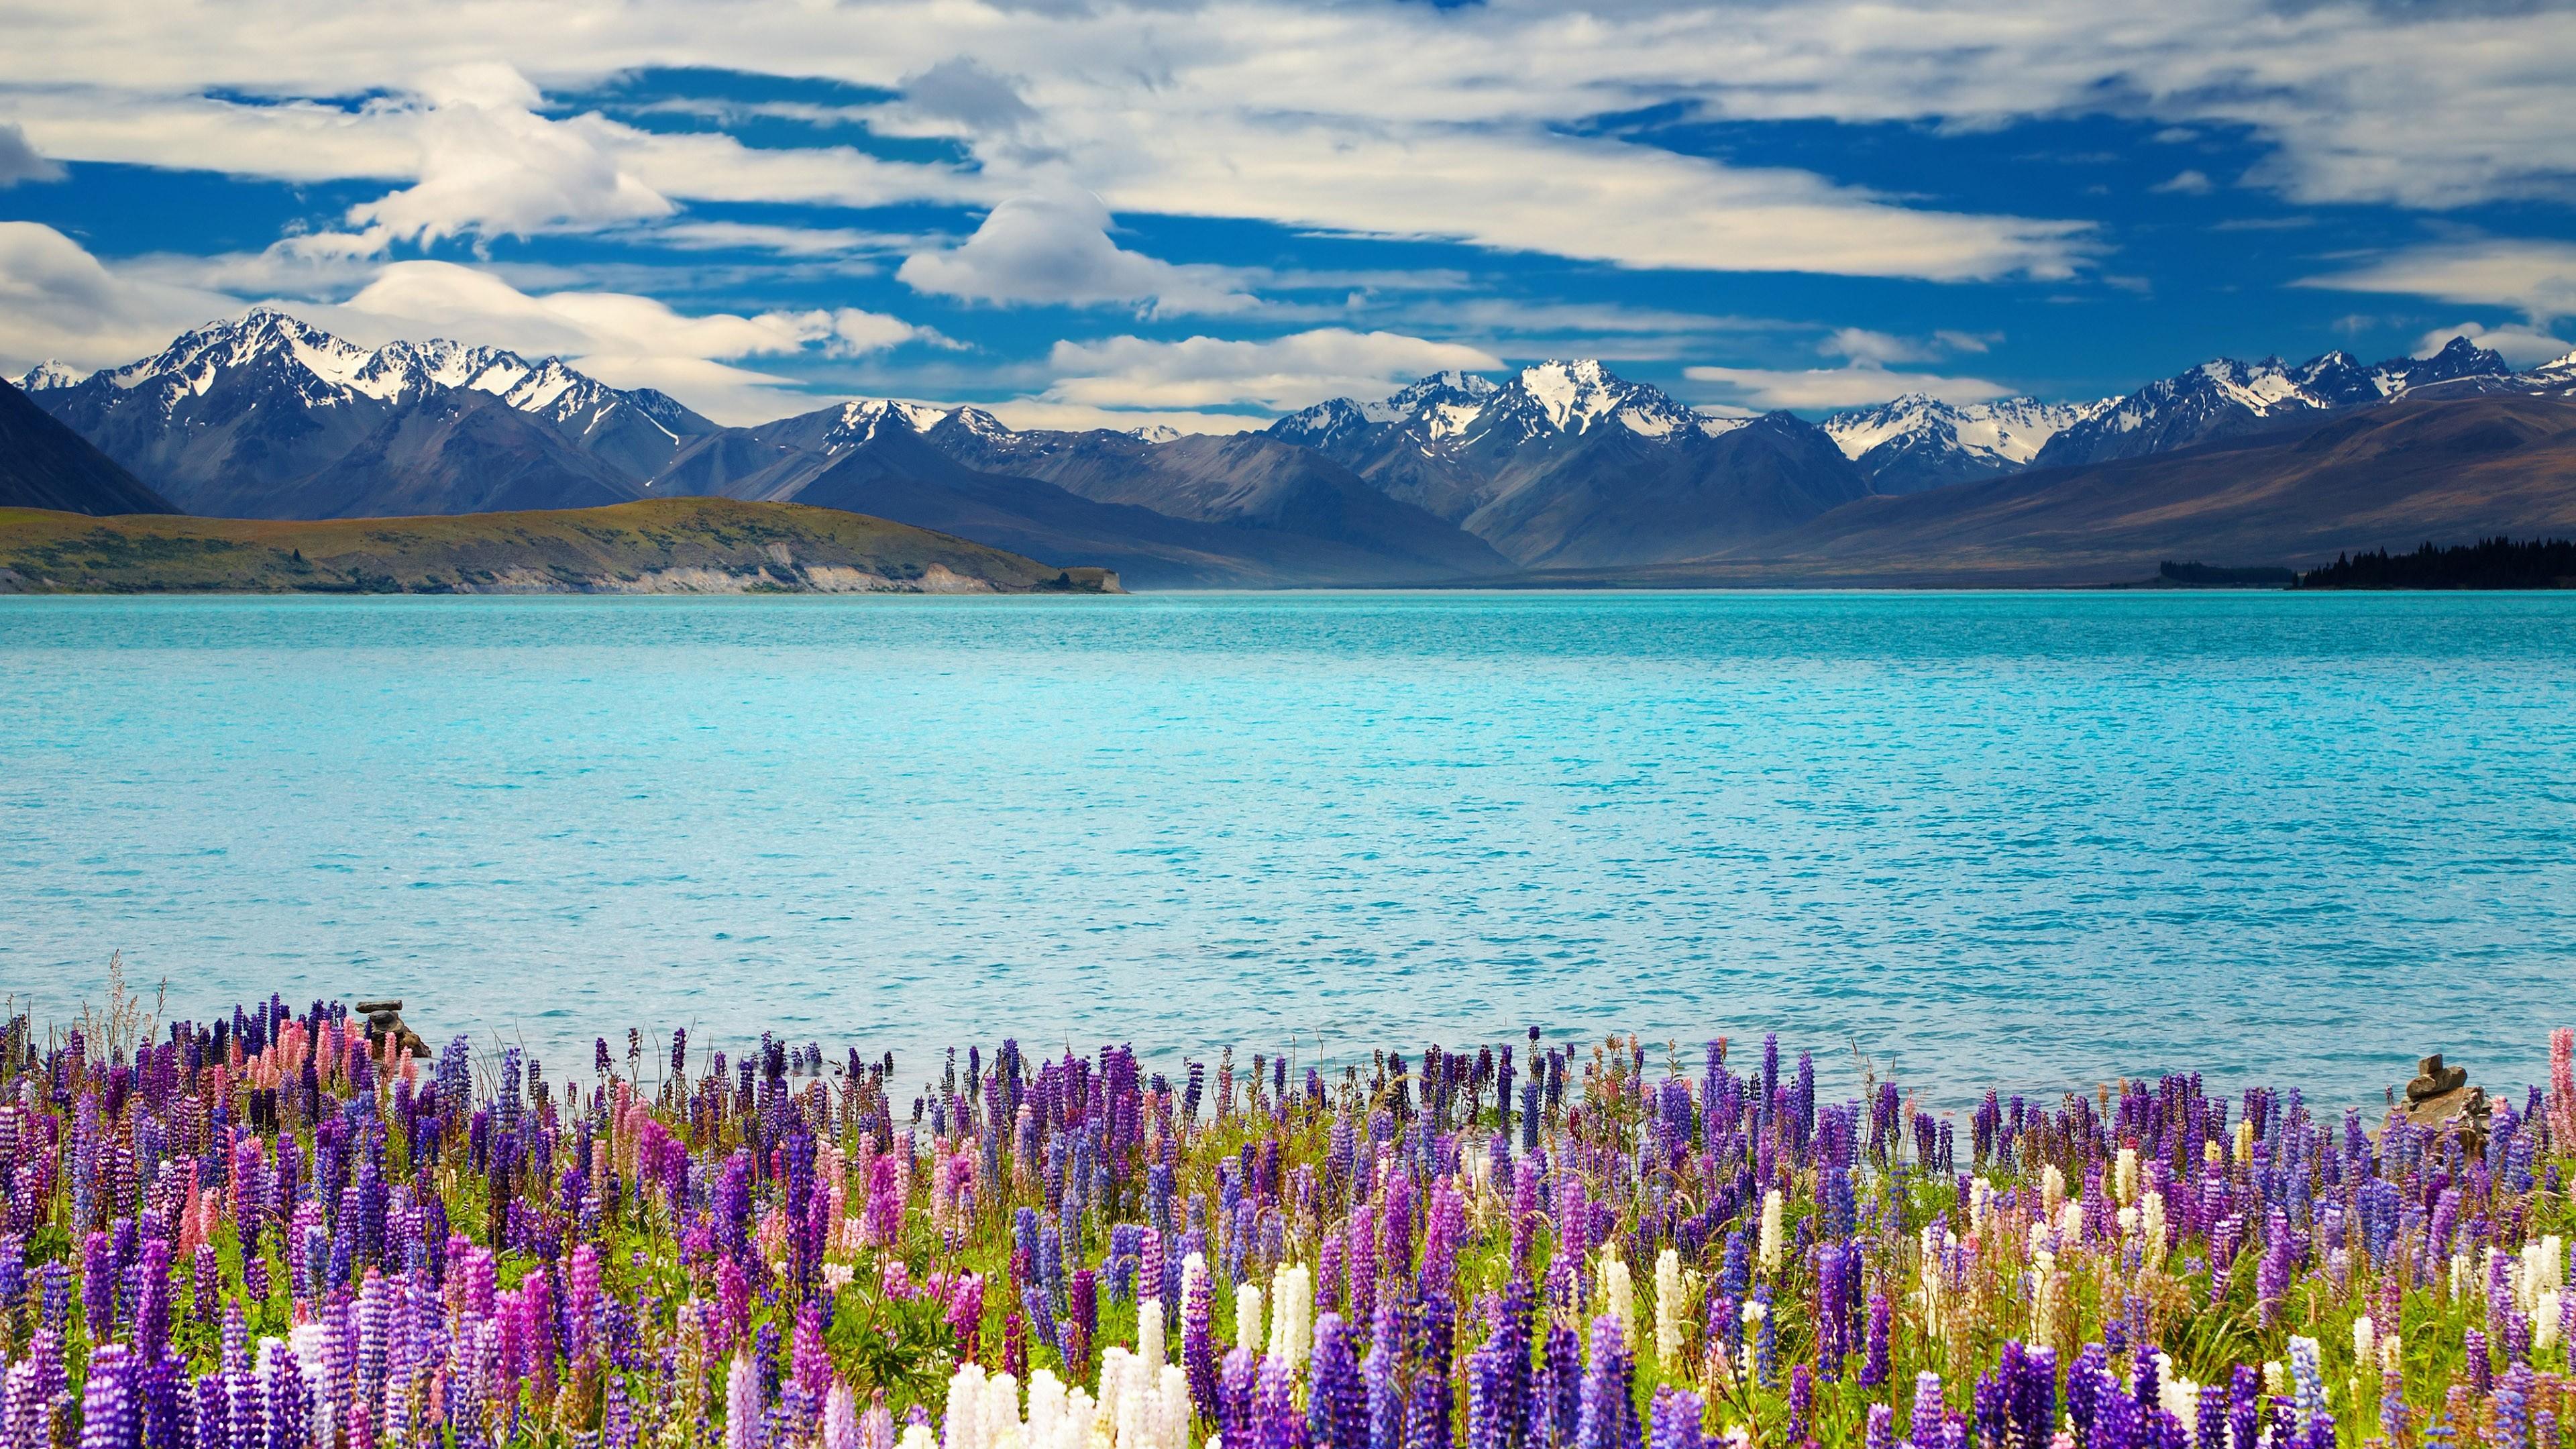 Beautiful Spring Scenery Lake HD Wallpaper   New HD Wallpapers 3840x2160